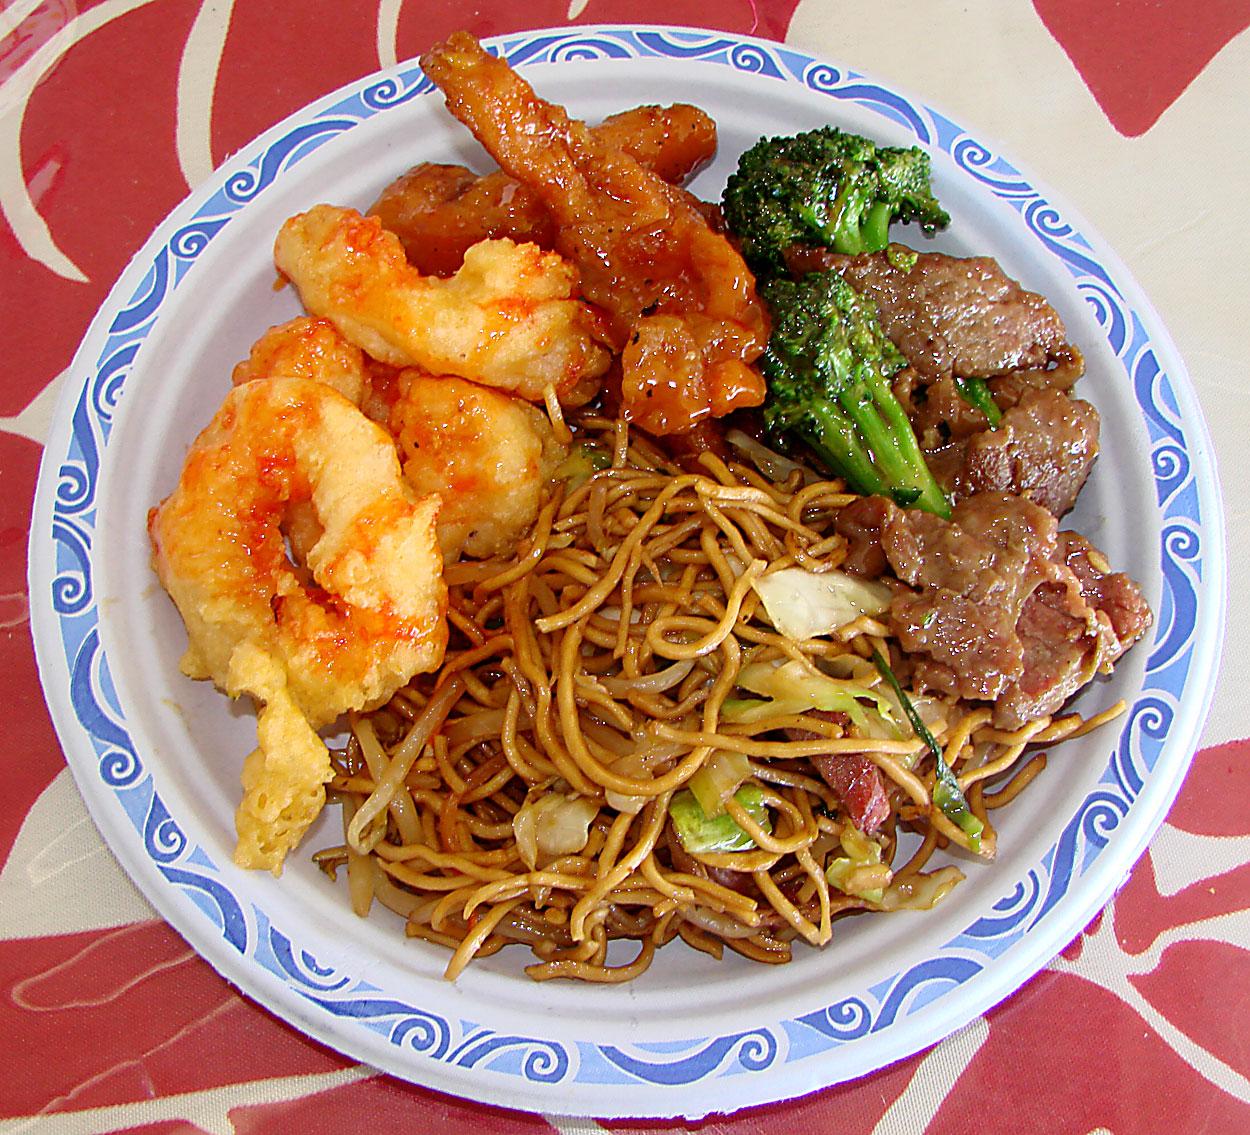 Everything looks ono! So how is it?  sc 1 st  Tasty Island & Mou0027iliu0027ili Eats: Golden Dynasty Chinese Restaurant u2013 Tasty Island